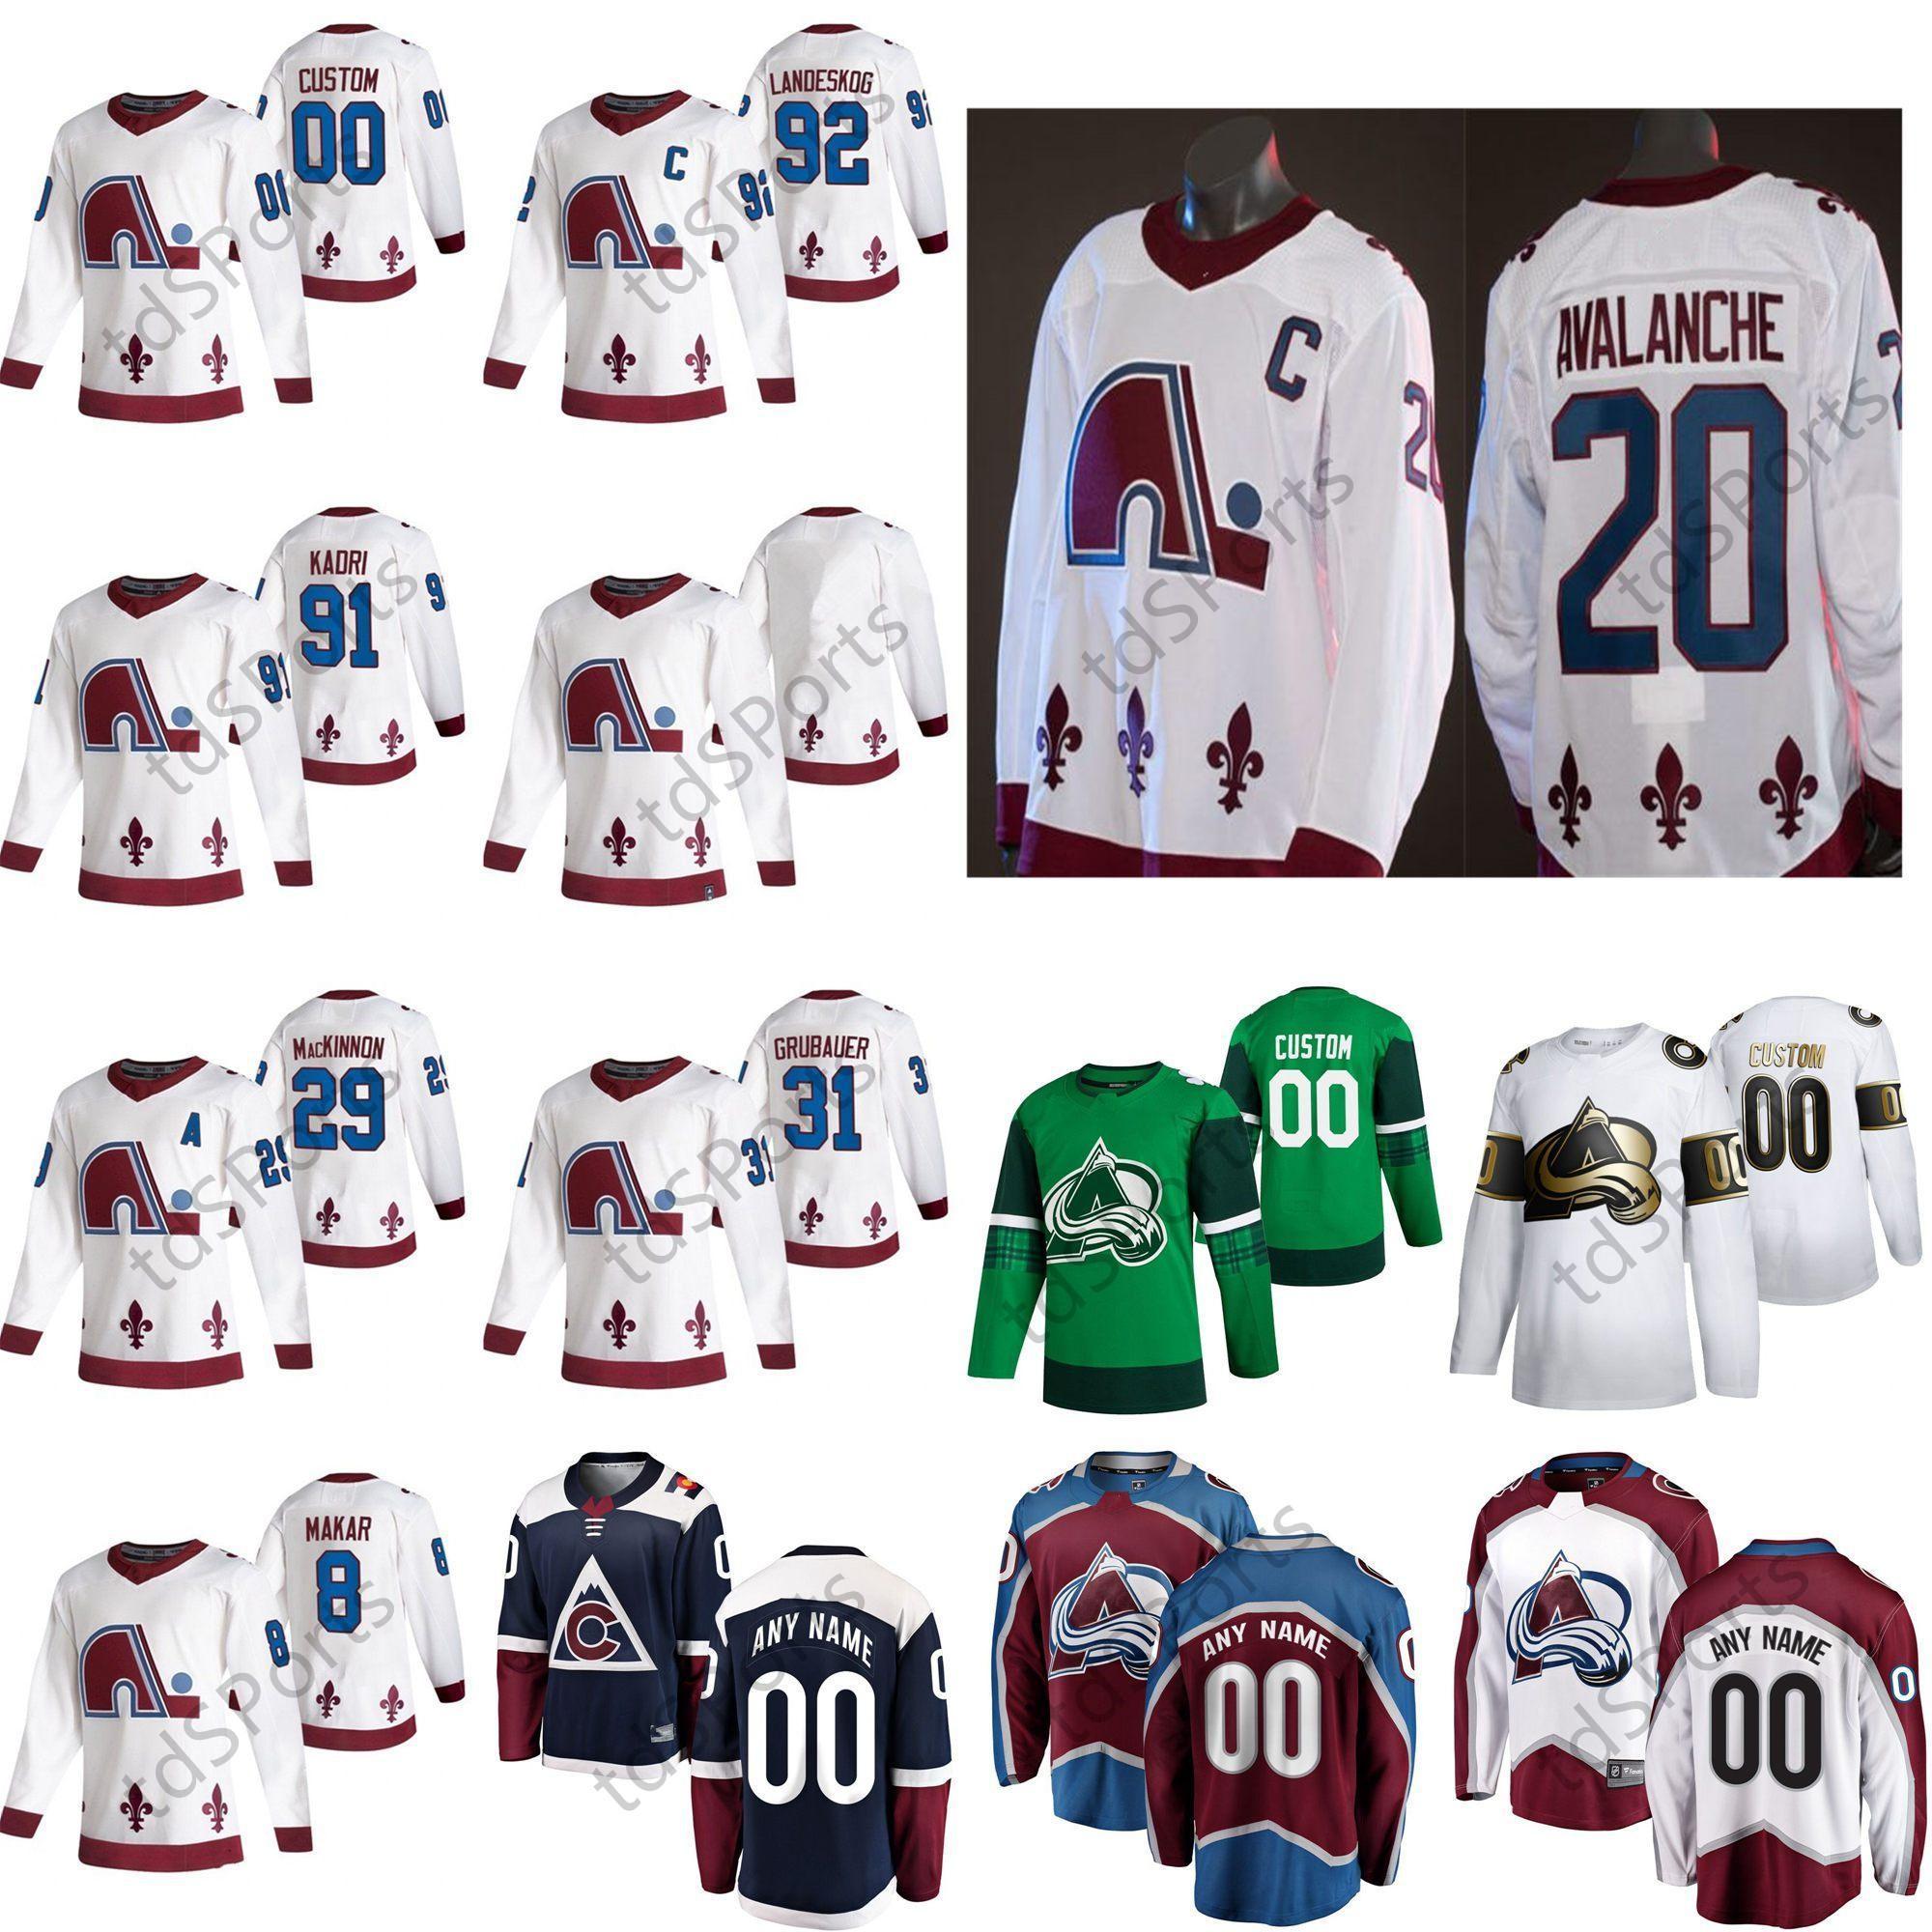 2021 Reverse Retro Colorado Avalanche Jersey Vladislav Kamenev Valeri Nichhuskkin Michael Hutchinson Matt Nieto Hóquei Jersey Costume Costume